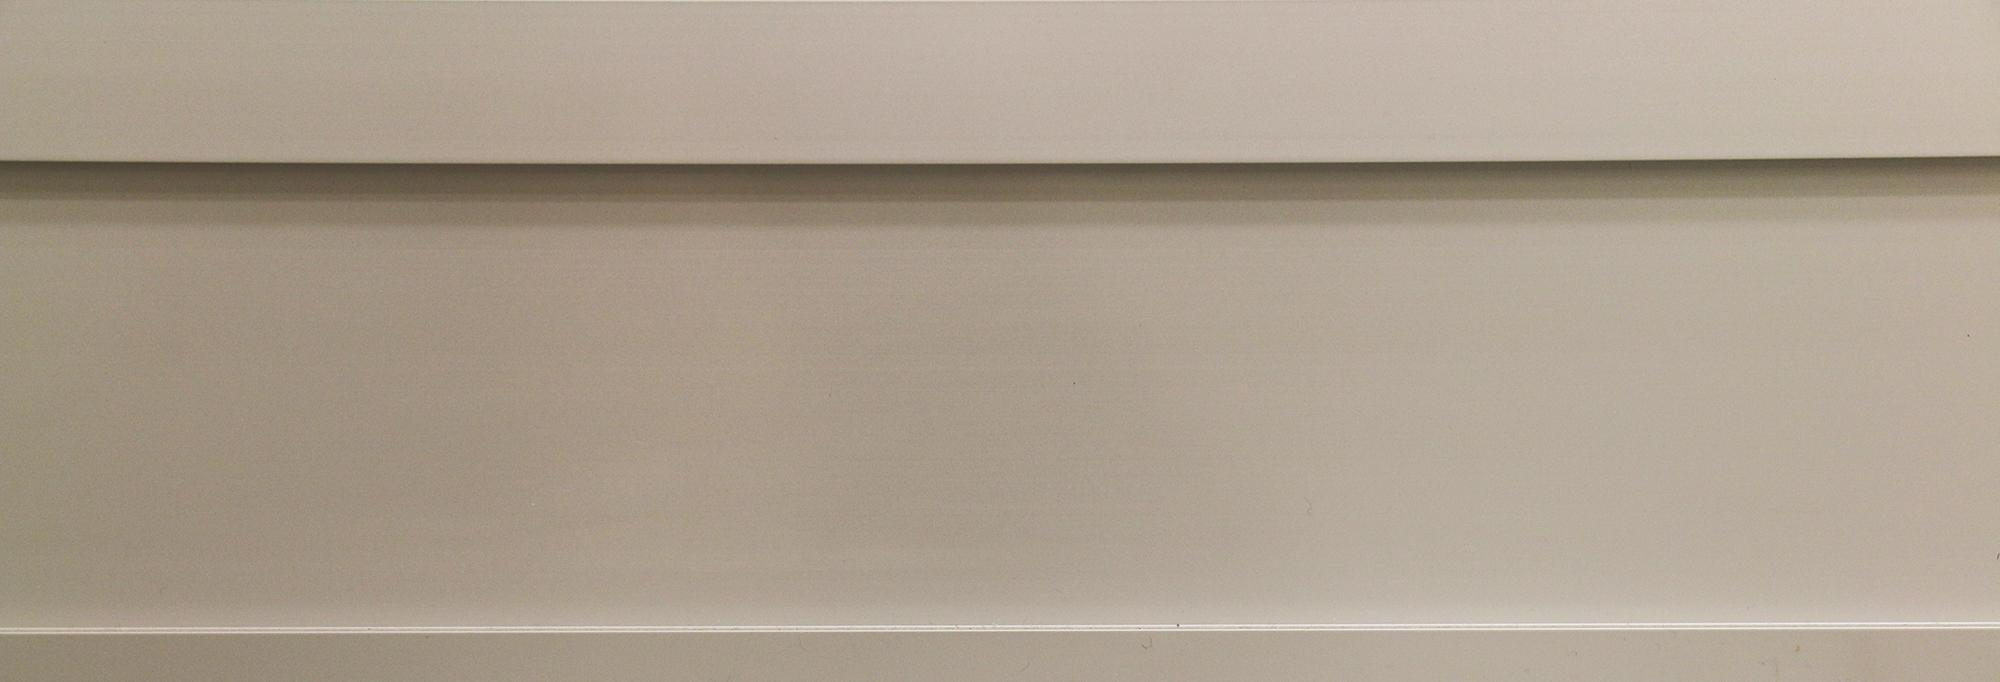 vinson-aluminum-baseboard-1